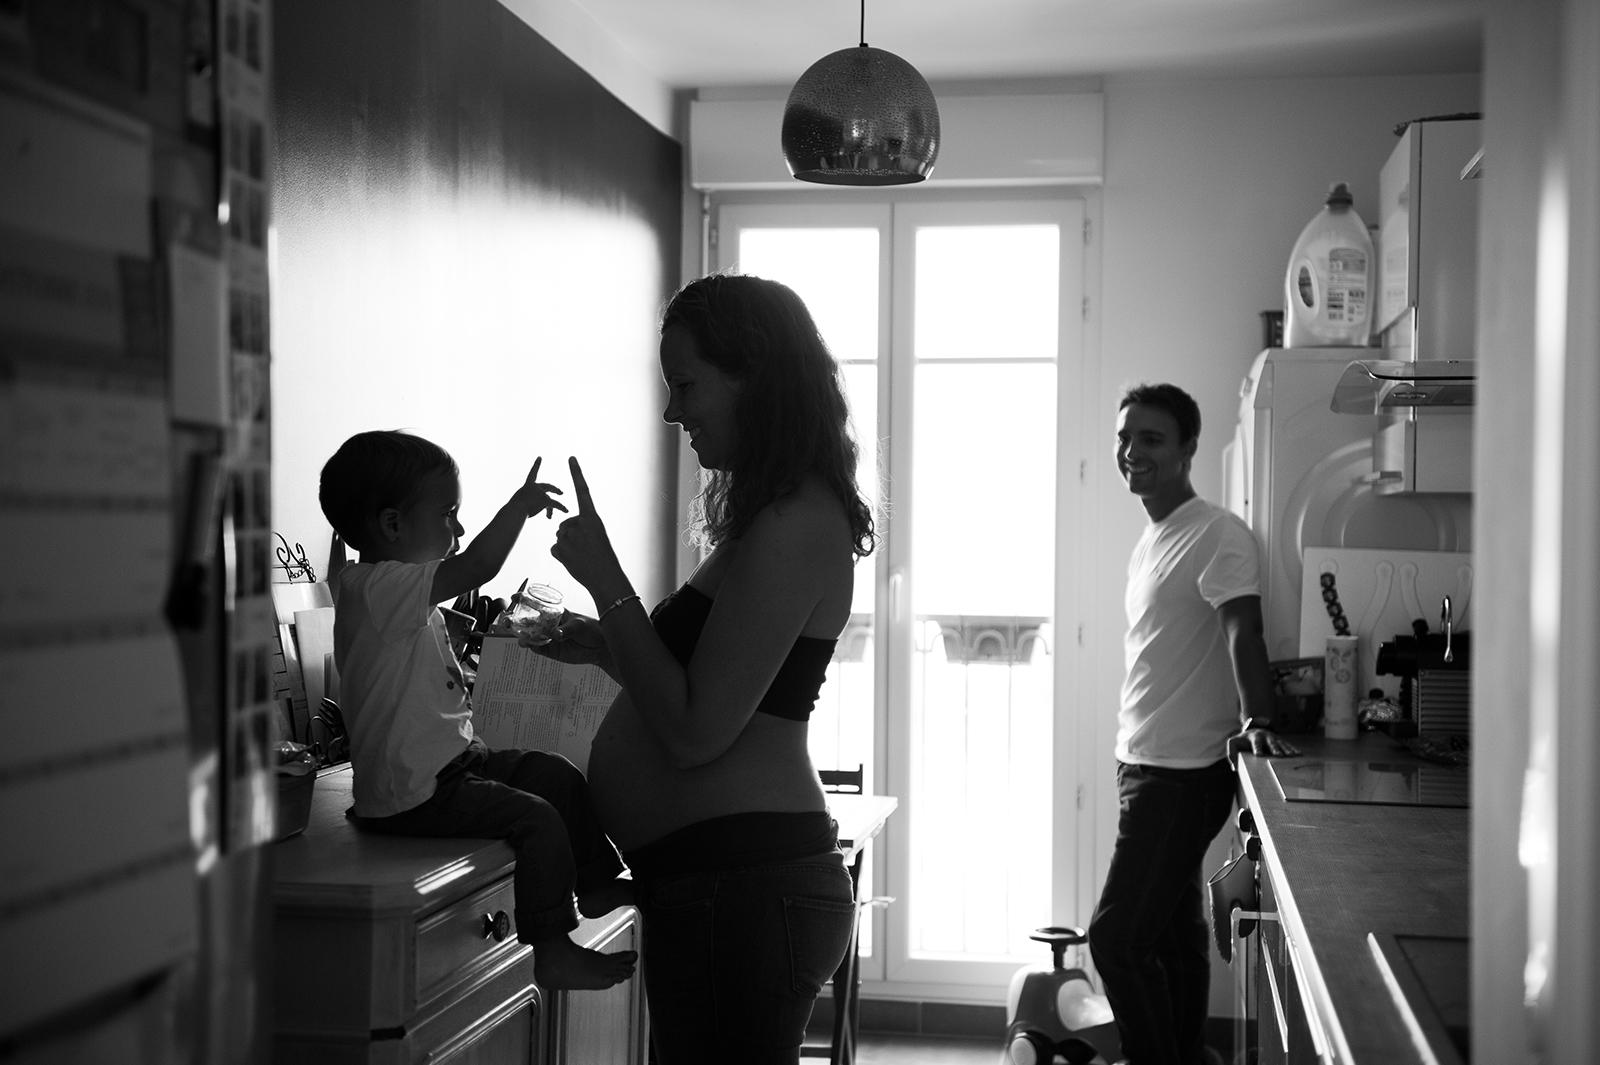 seance-photo-famille-photo-grossesse-photo-bébé-naissance-sabrina-godemert-photographe-seine-et-marne008